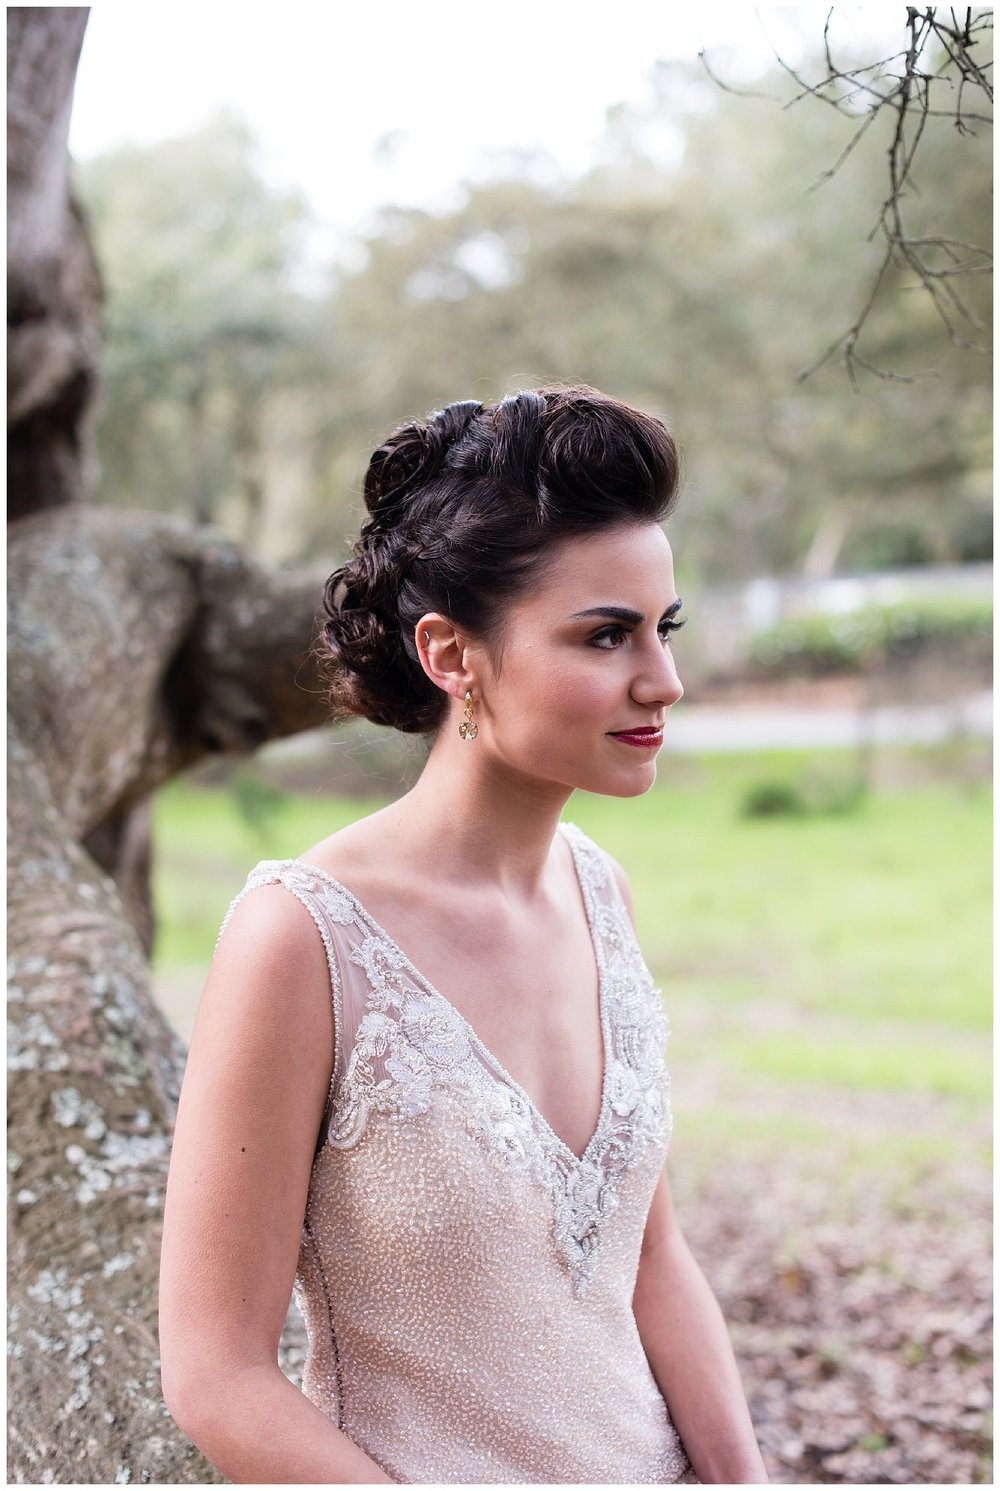 badgley-mischka-beaded-wedding-dress-winter-bride.jpg